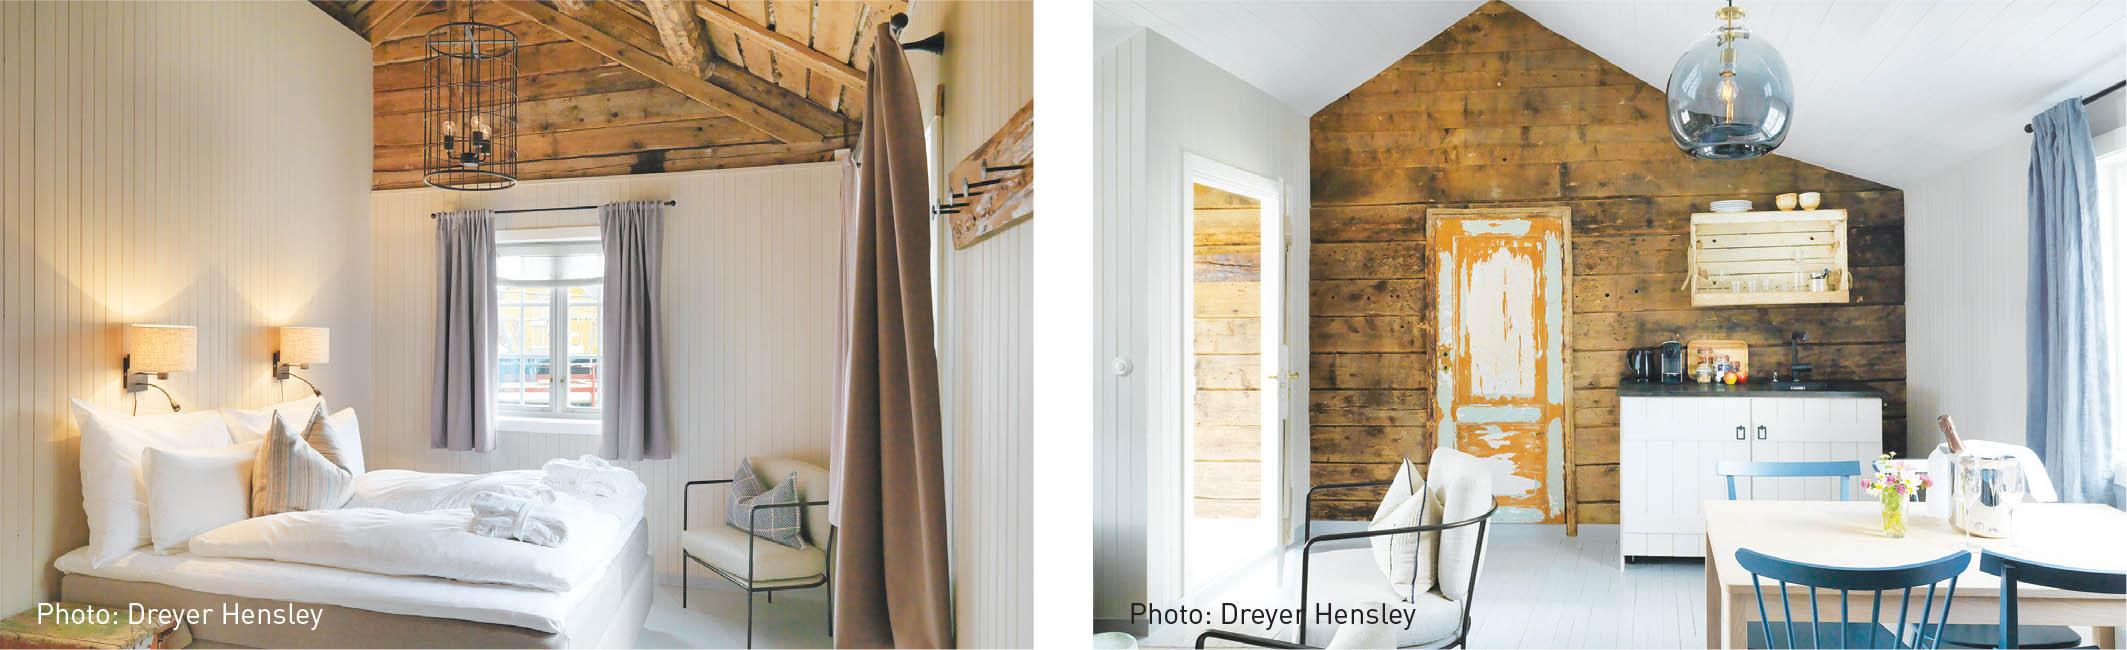 Nusfjord Arctic Resort, Recharge and explore - Scan Magazine